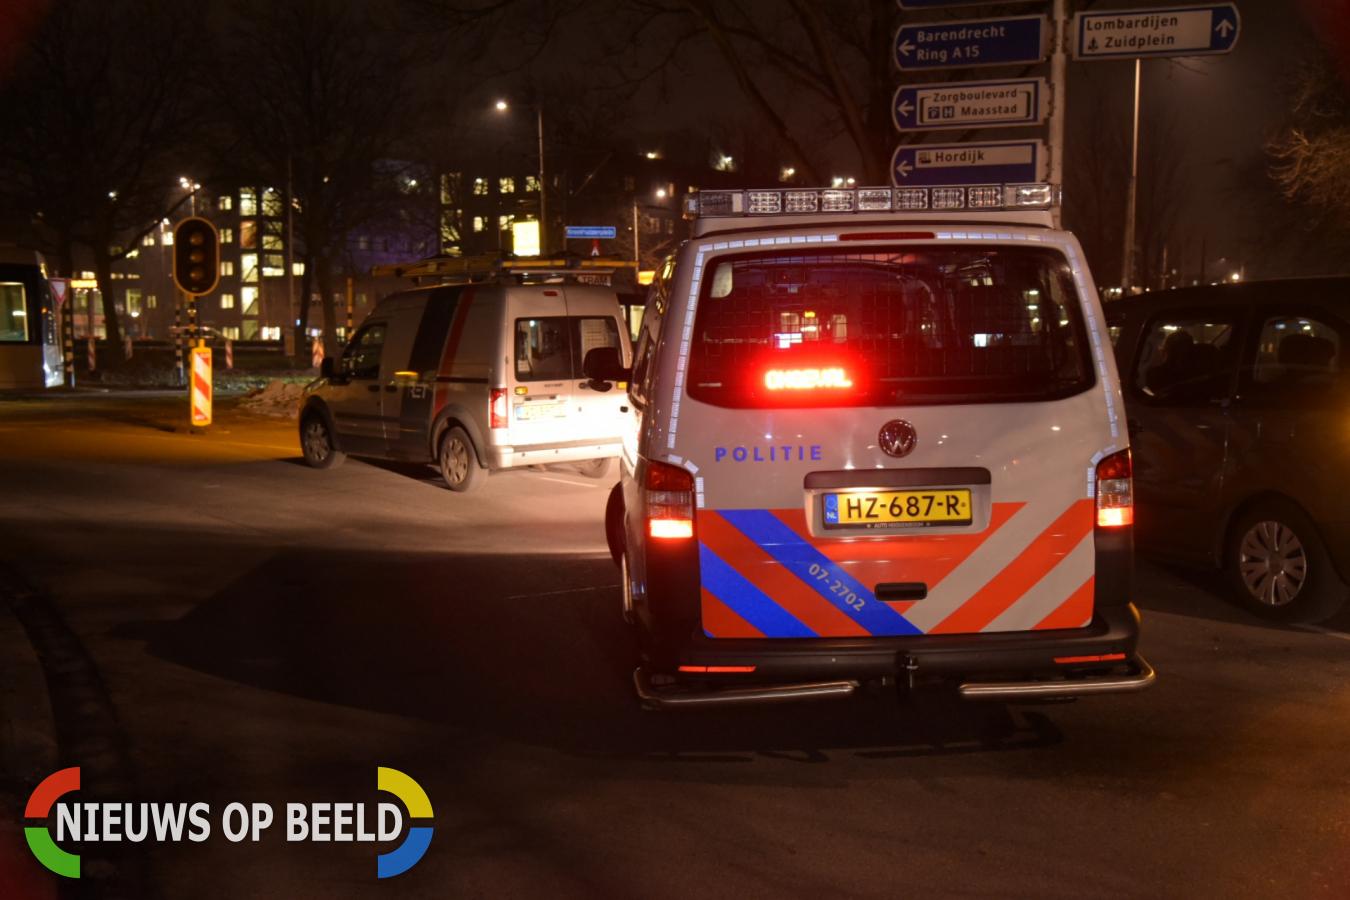 Auto zwaar beschadigd na botsing met tram Kreekhuizenplein Rotterdam